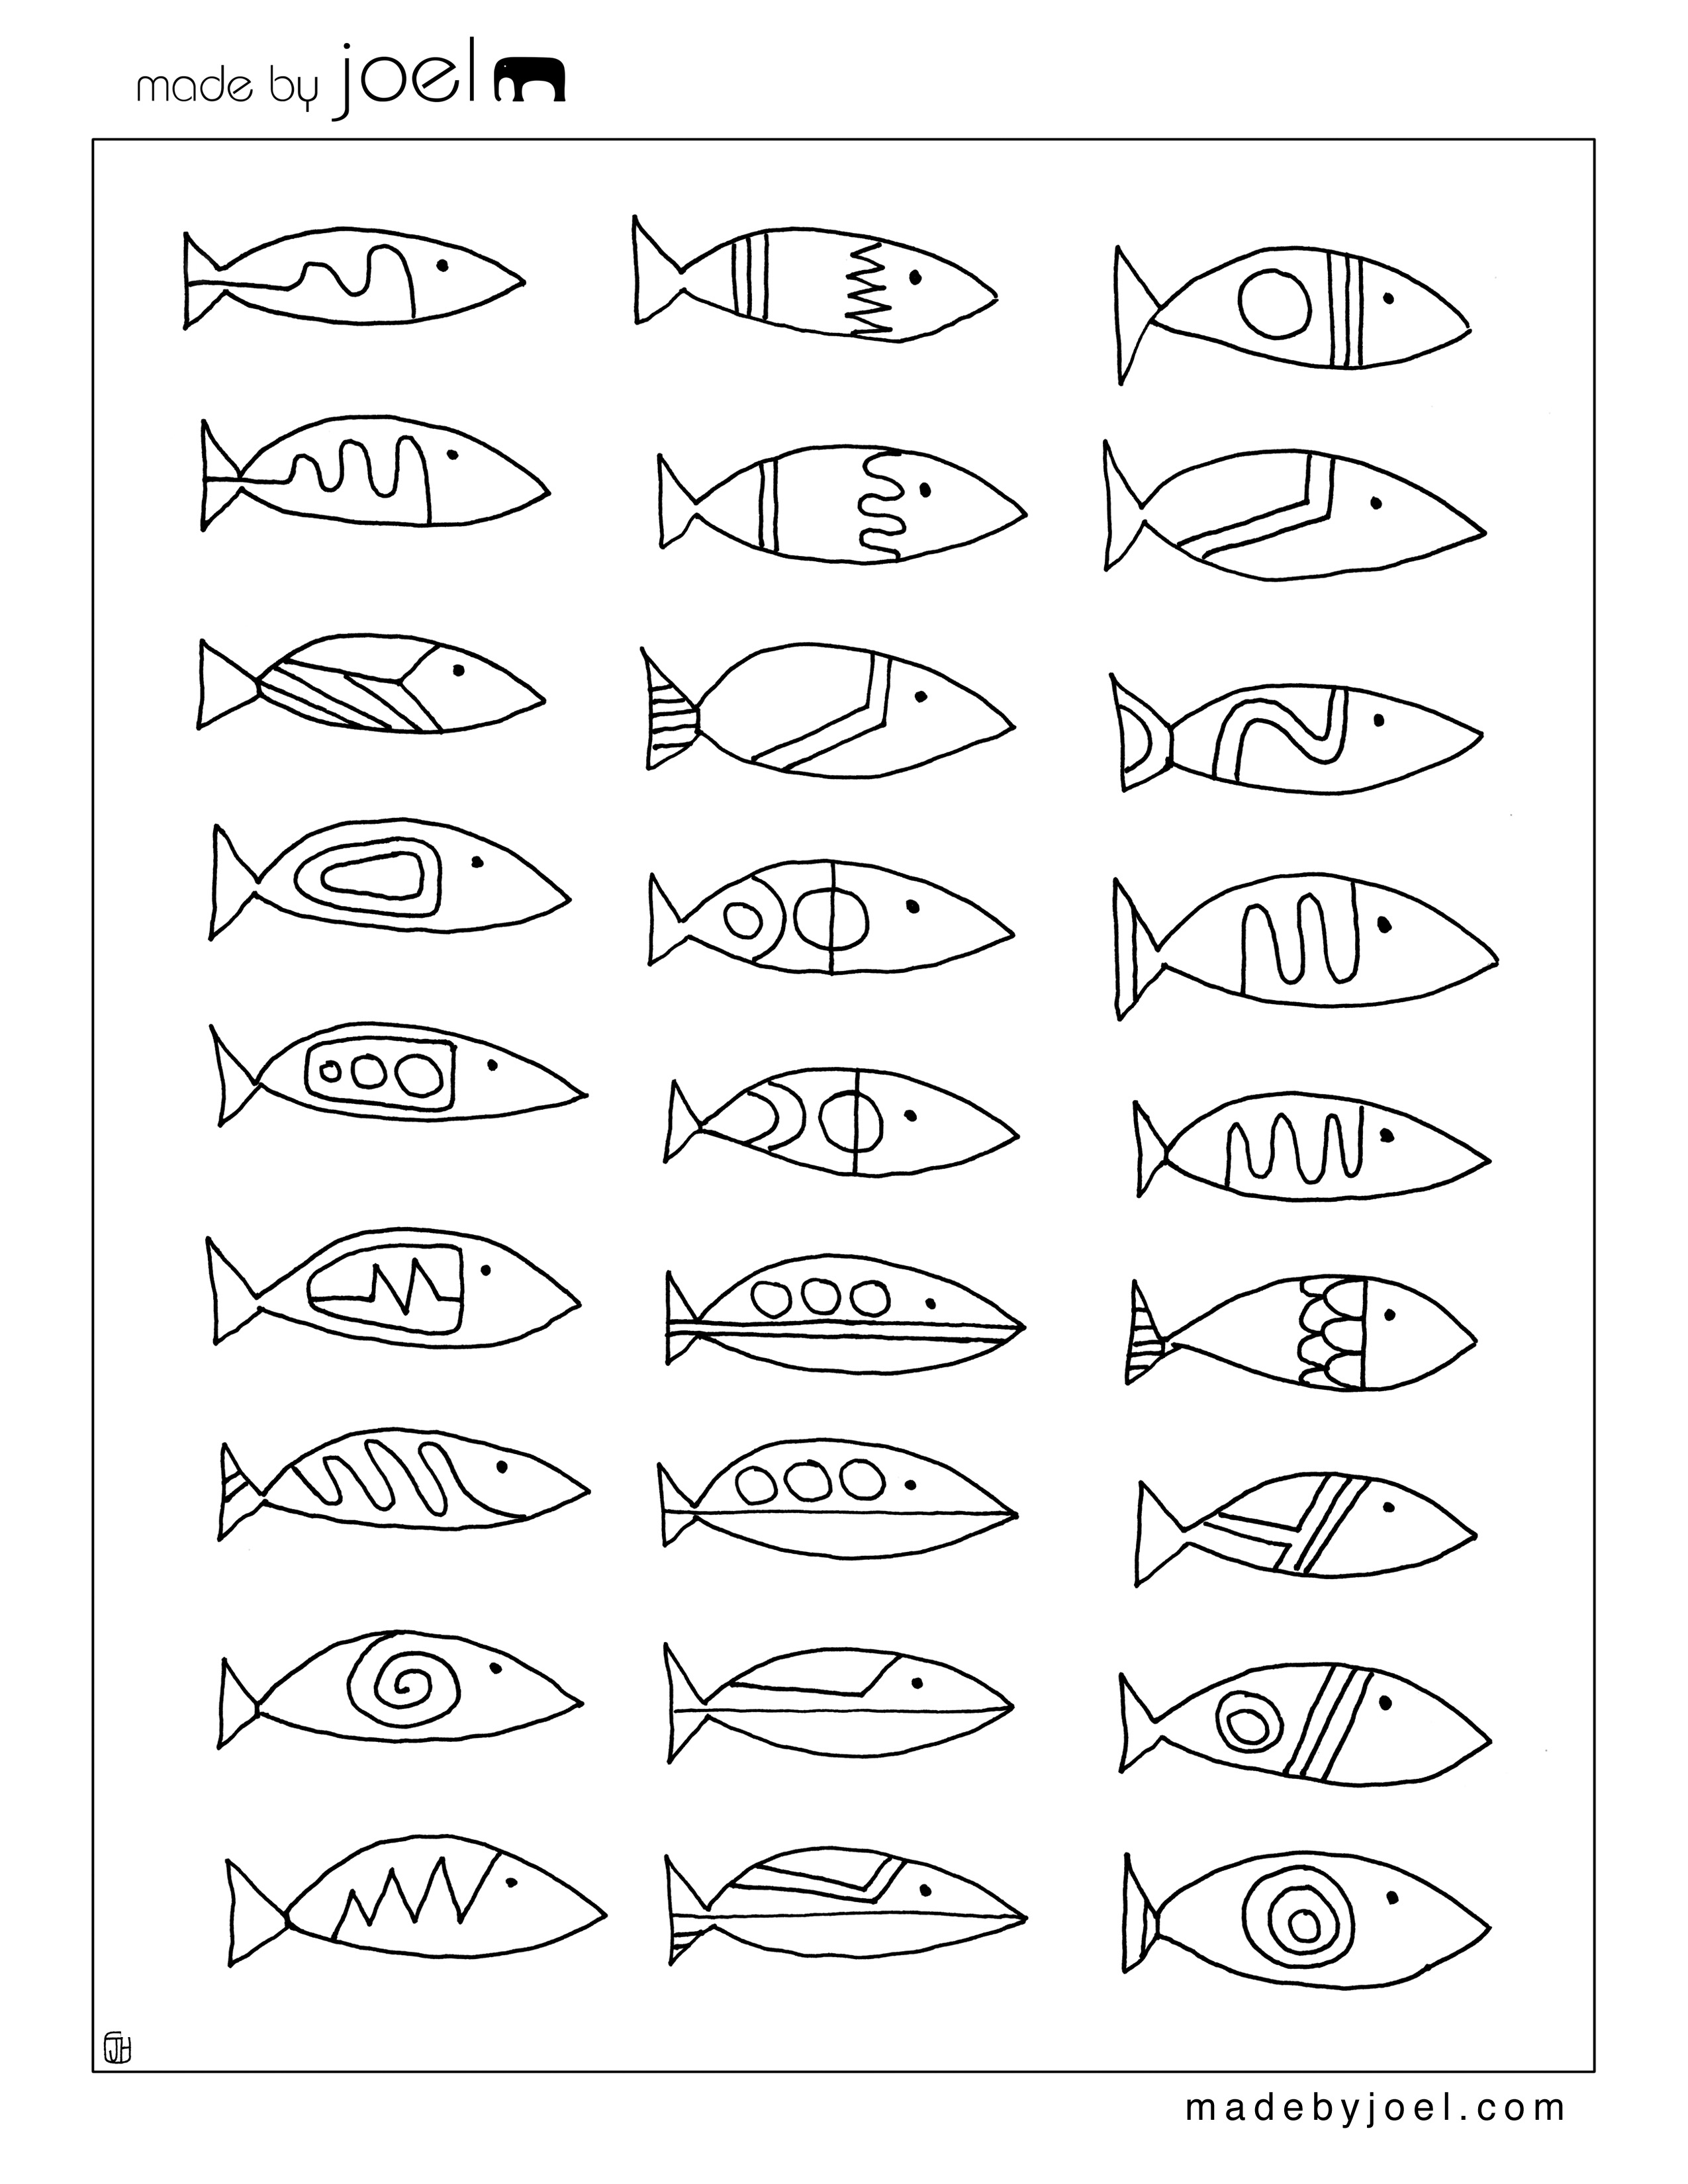 Made By Joel Made By Joel Modern Fish Designs Coloring Sheet Free Printable Template